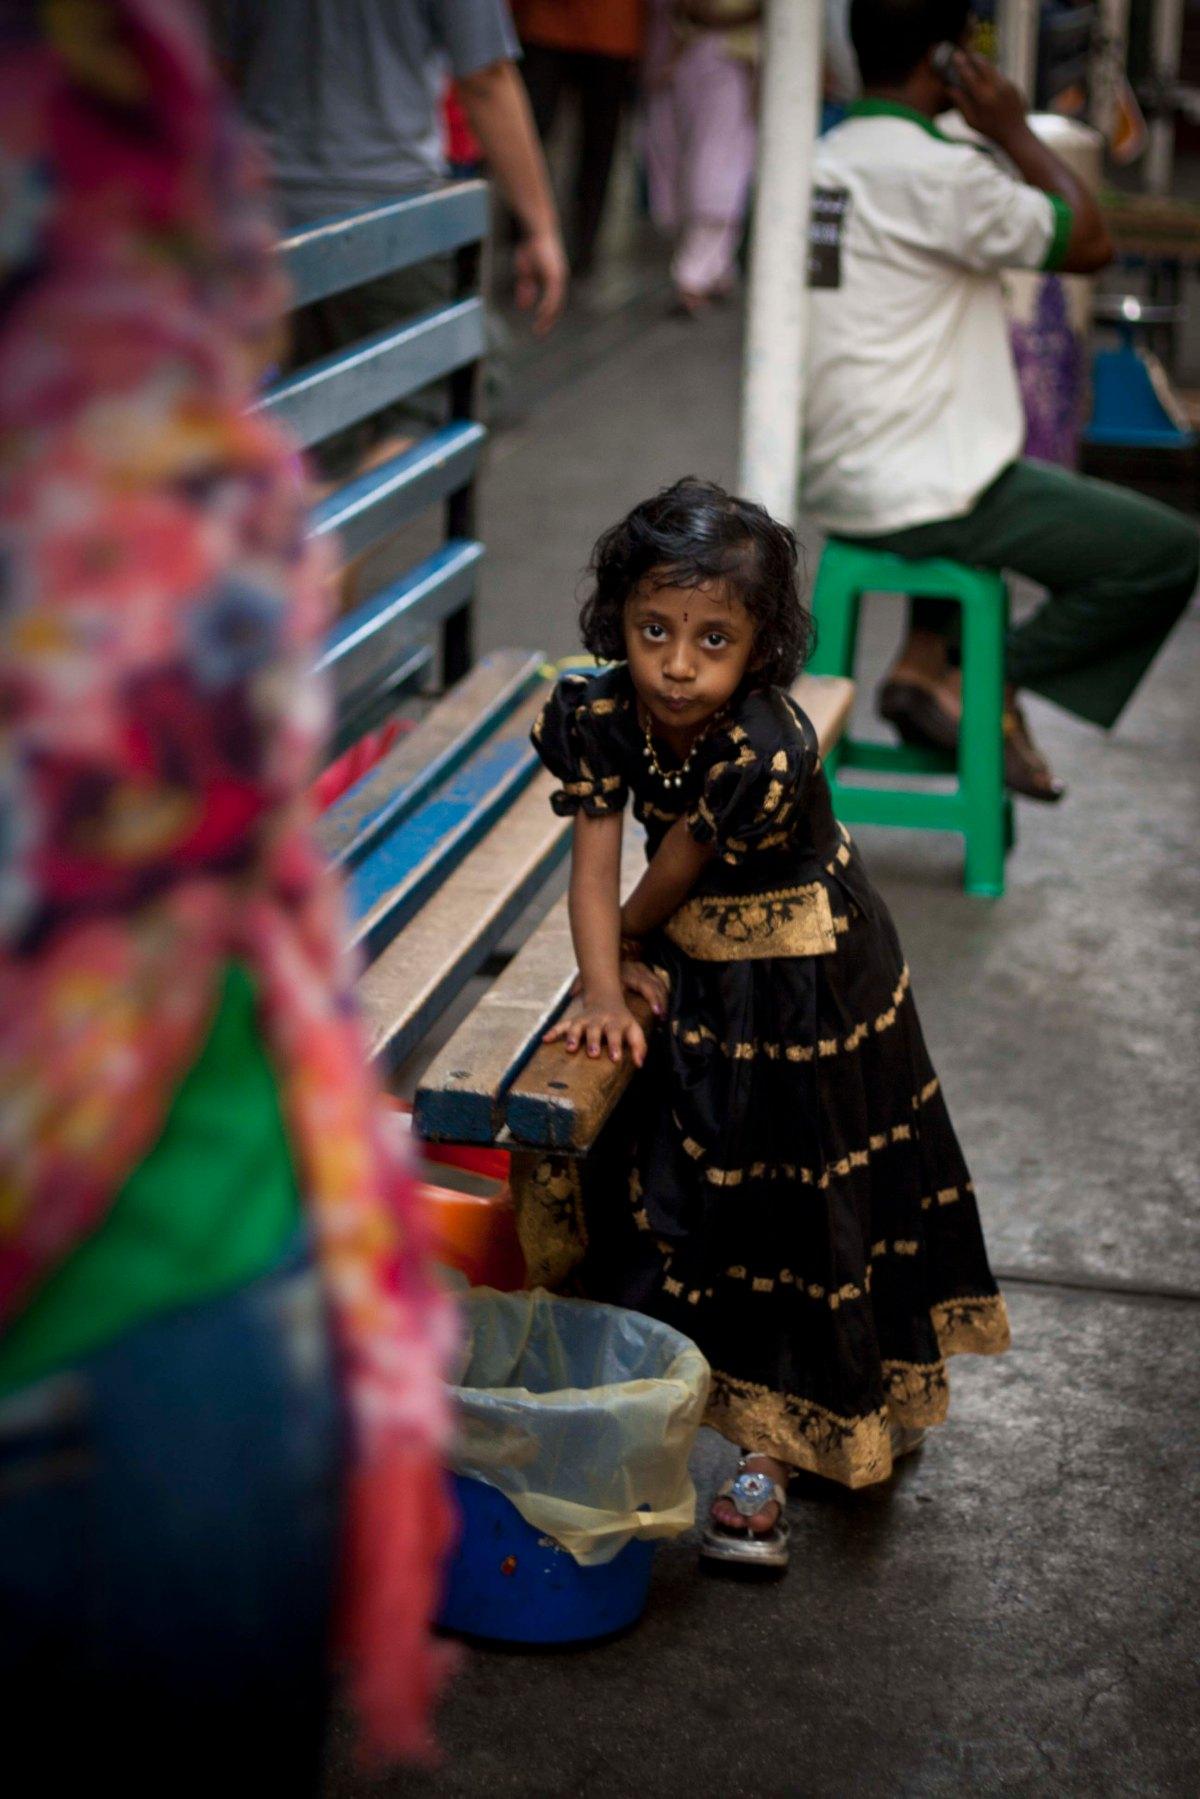 Young Market Girl - Fruit and Vegetable Market, Dubai, UAE